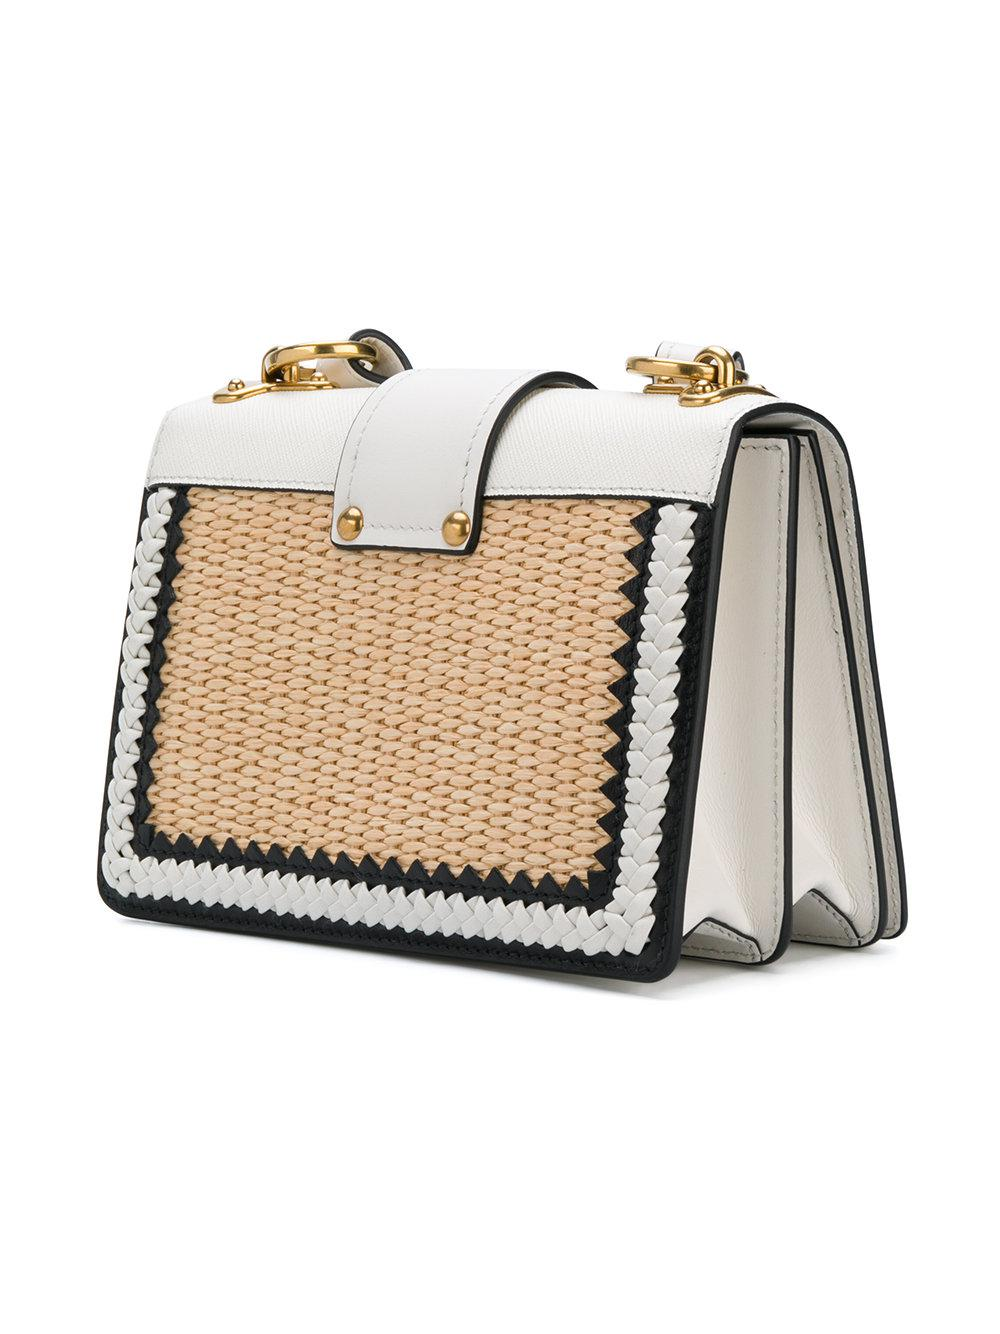 cba8d48736d5 Prada White Raffia Cahier Shoulder Bag in White - Lyst